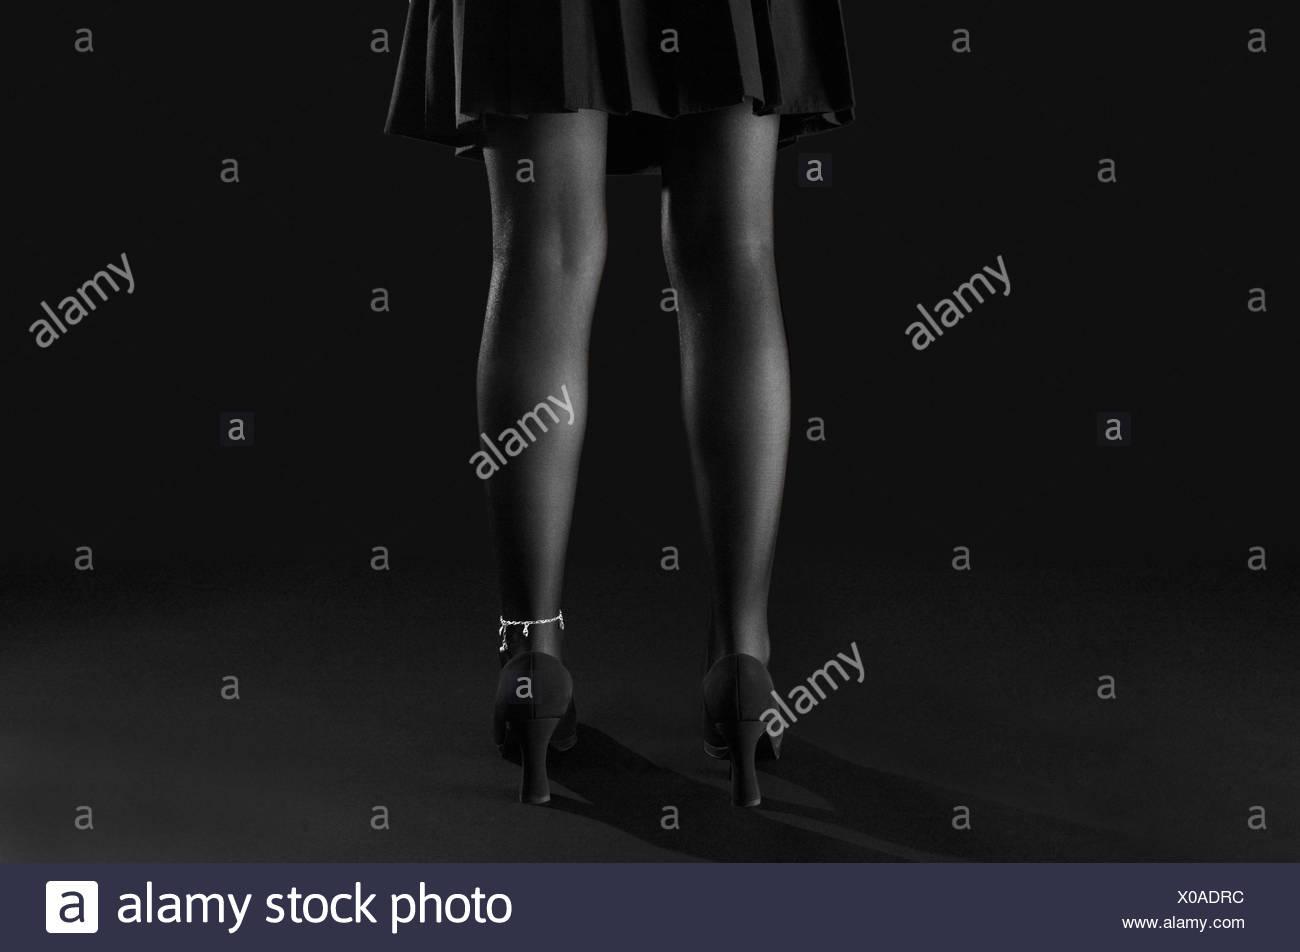 legs bw black swarthy jetblack deep black shoes chain stocking stockings leg - Stock Image